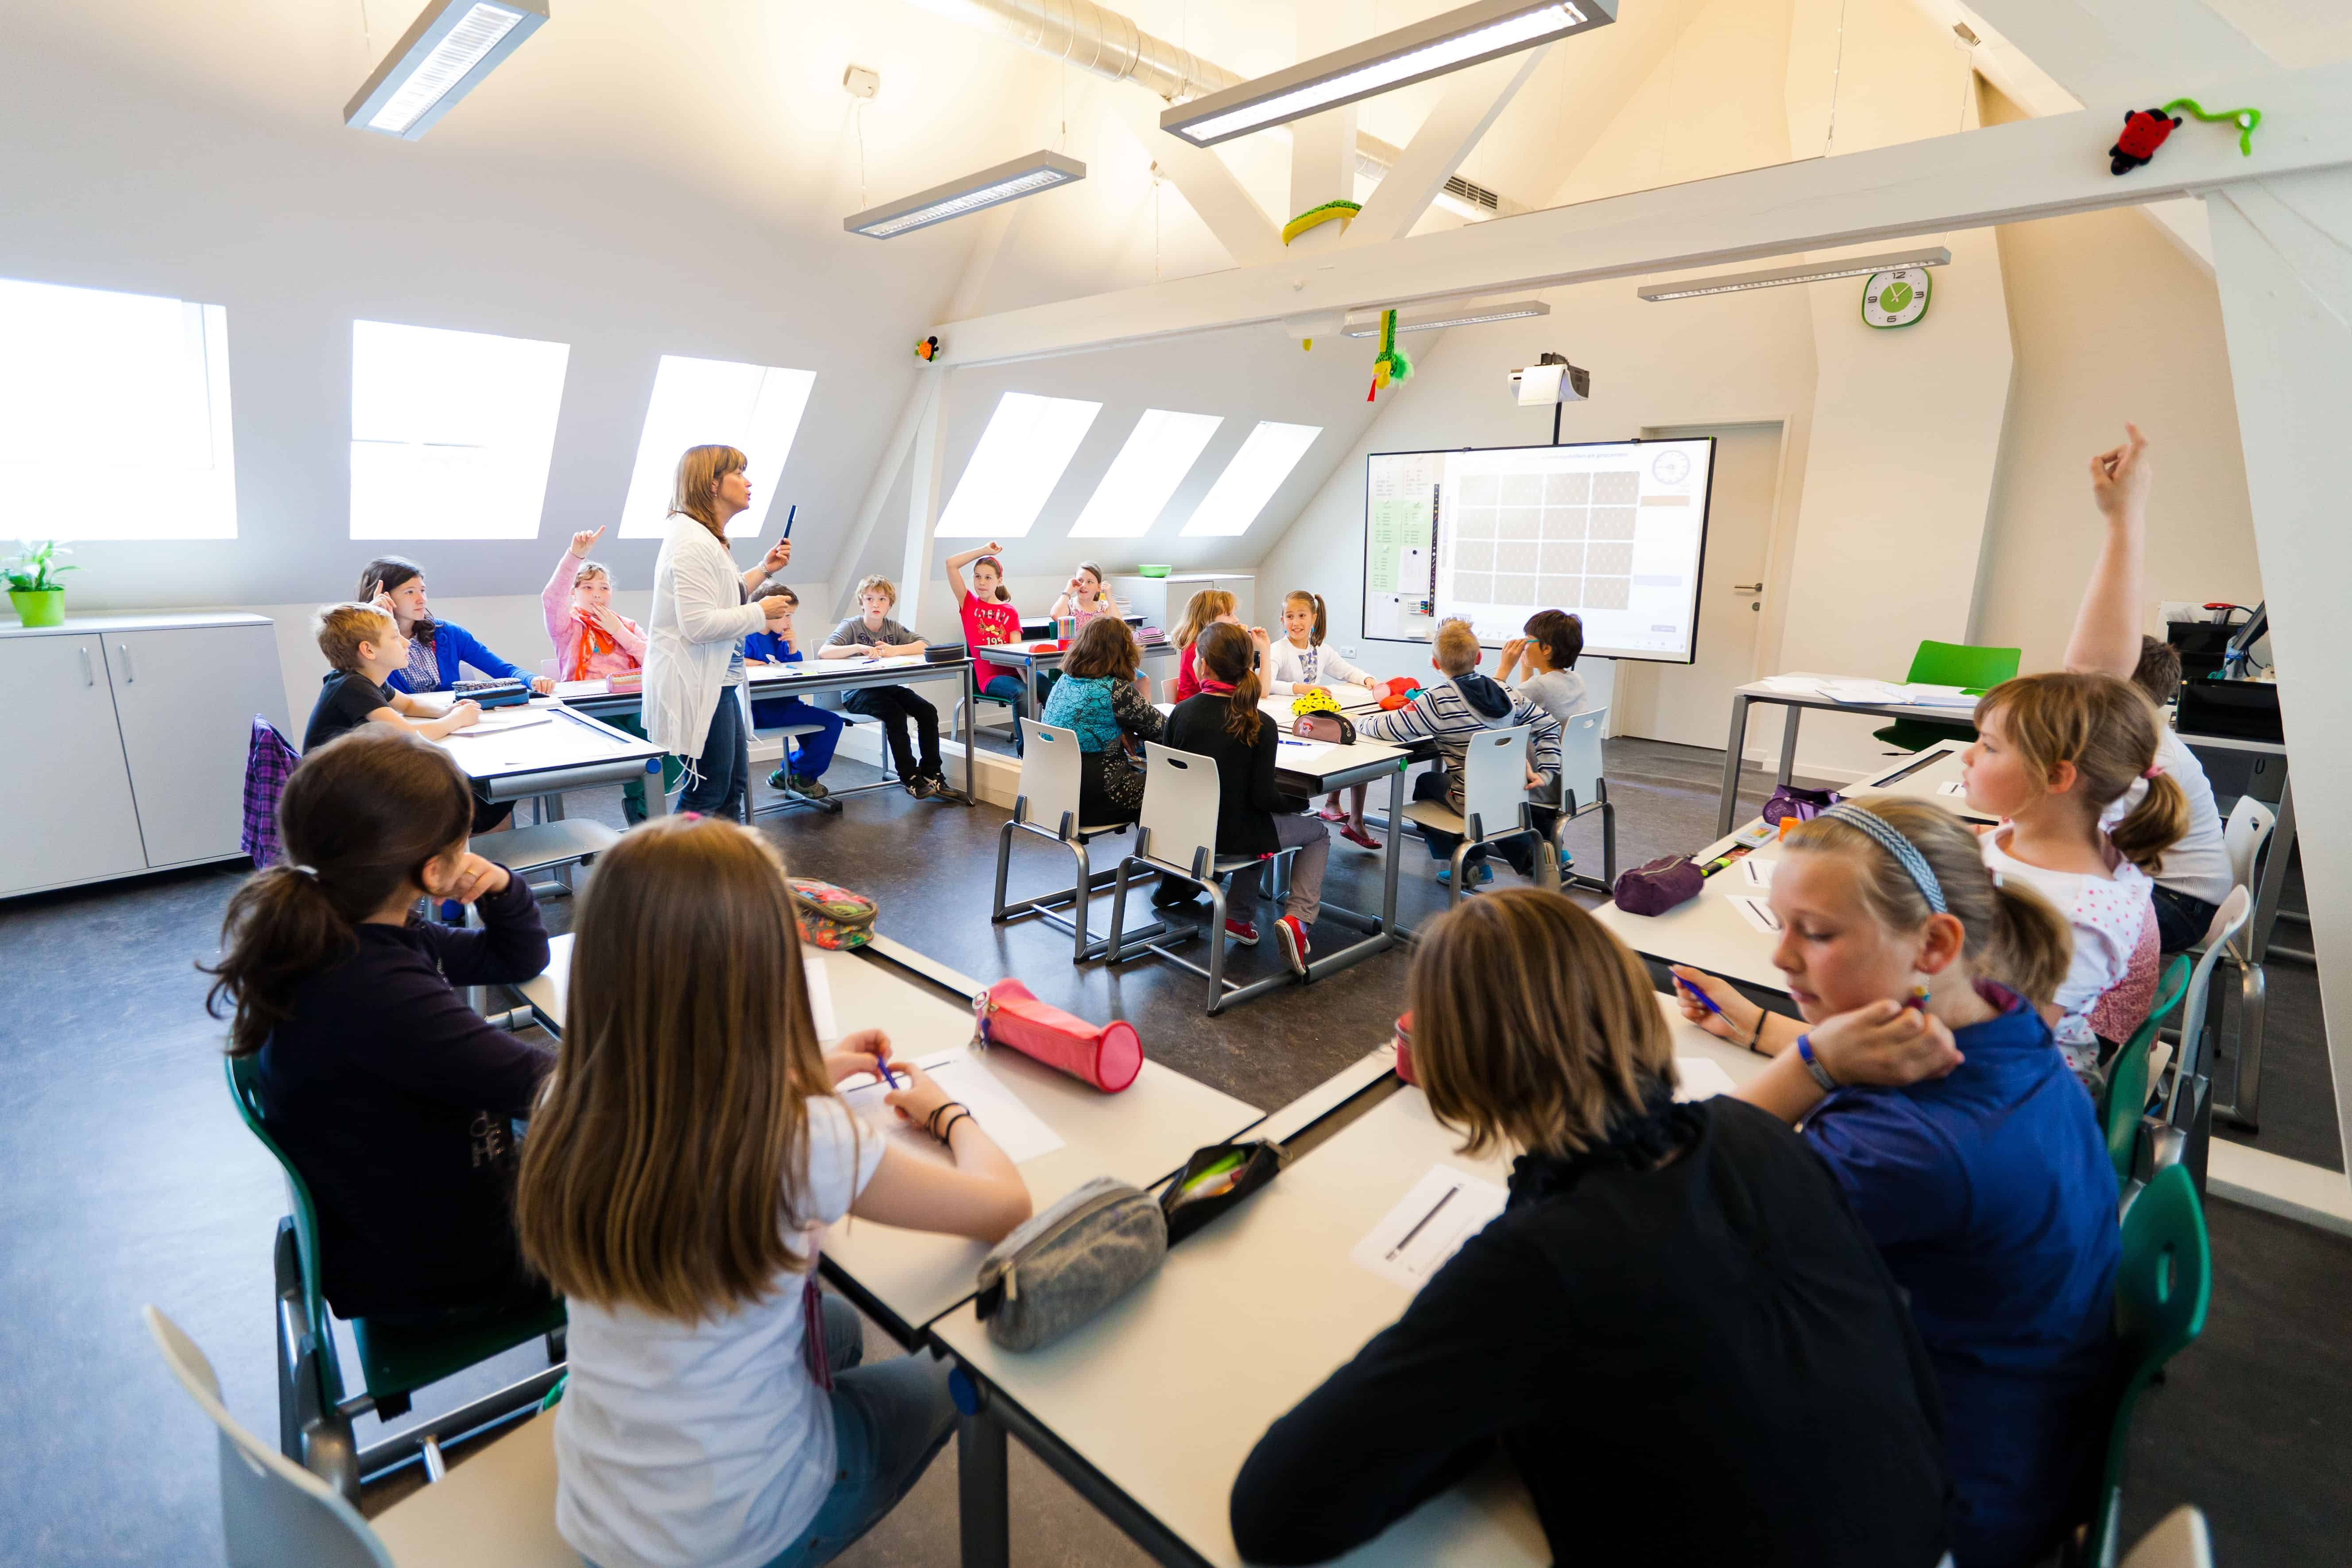 4 Key Elements Of 21st Century Classroom Design